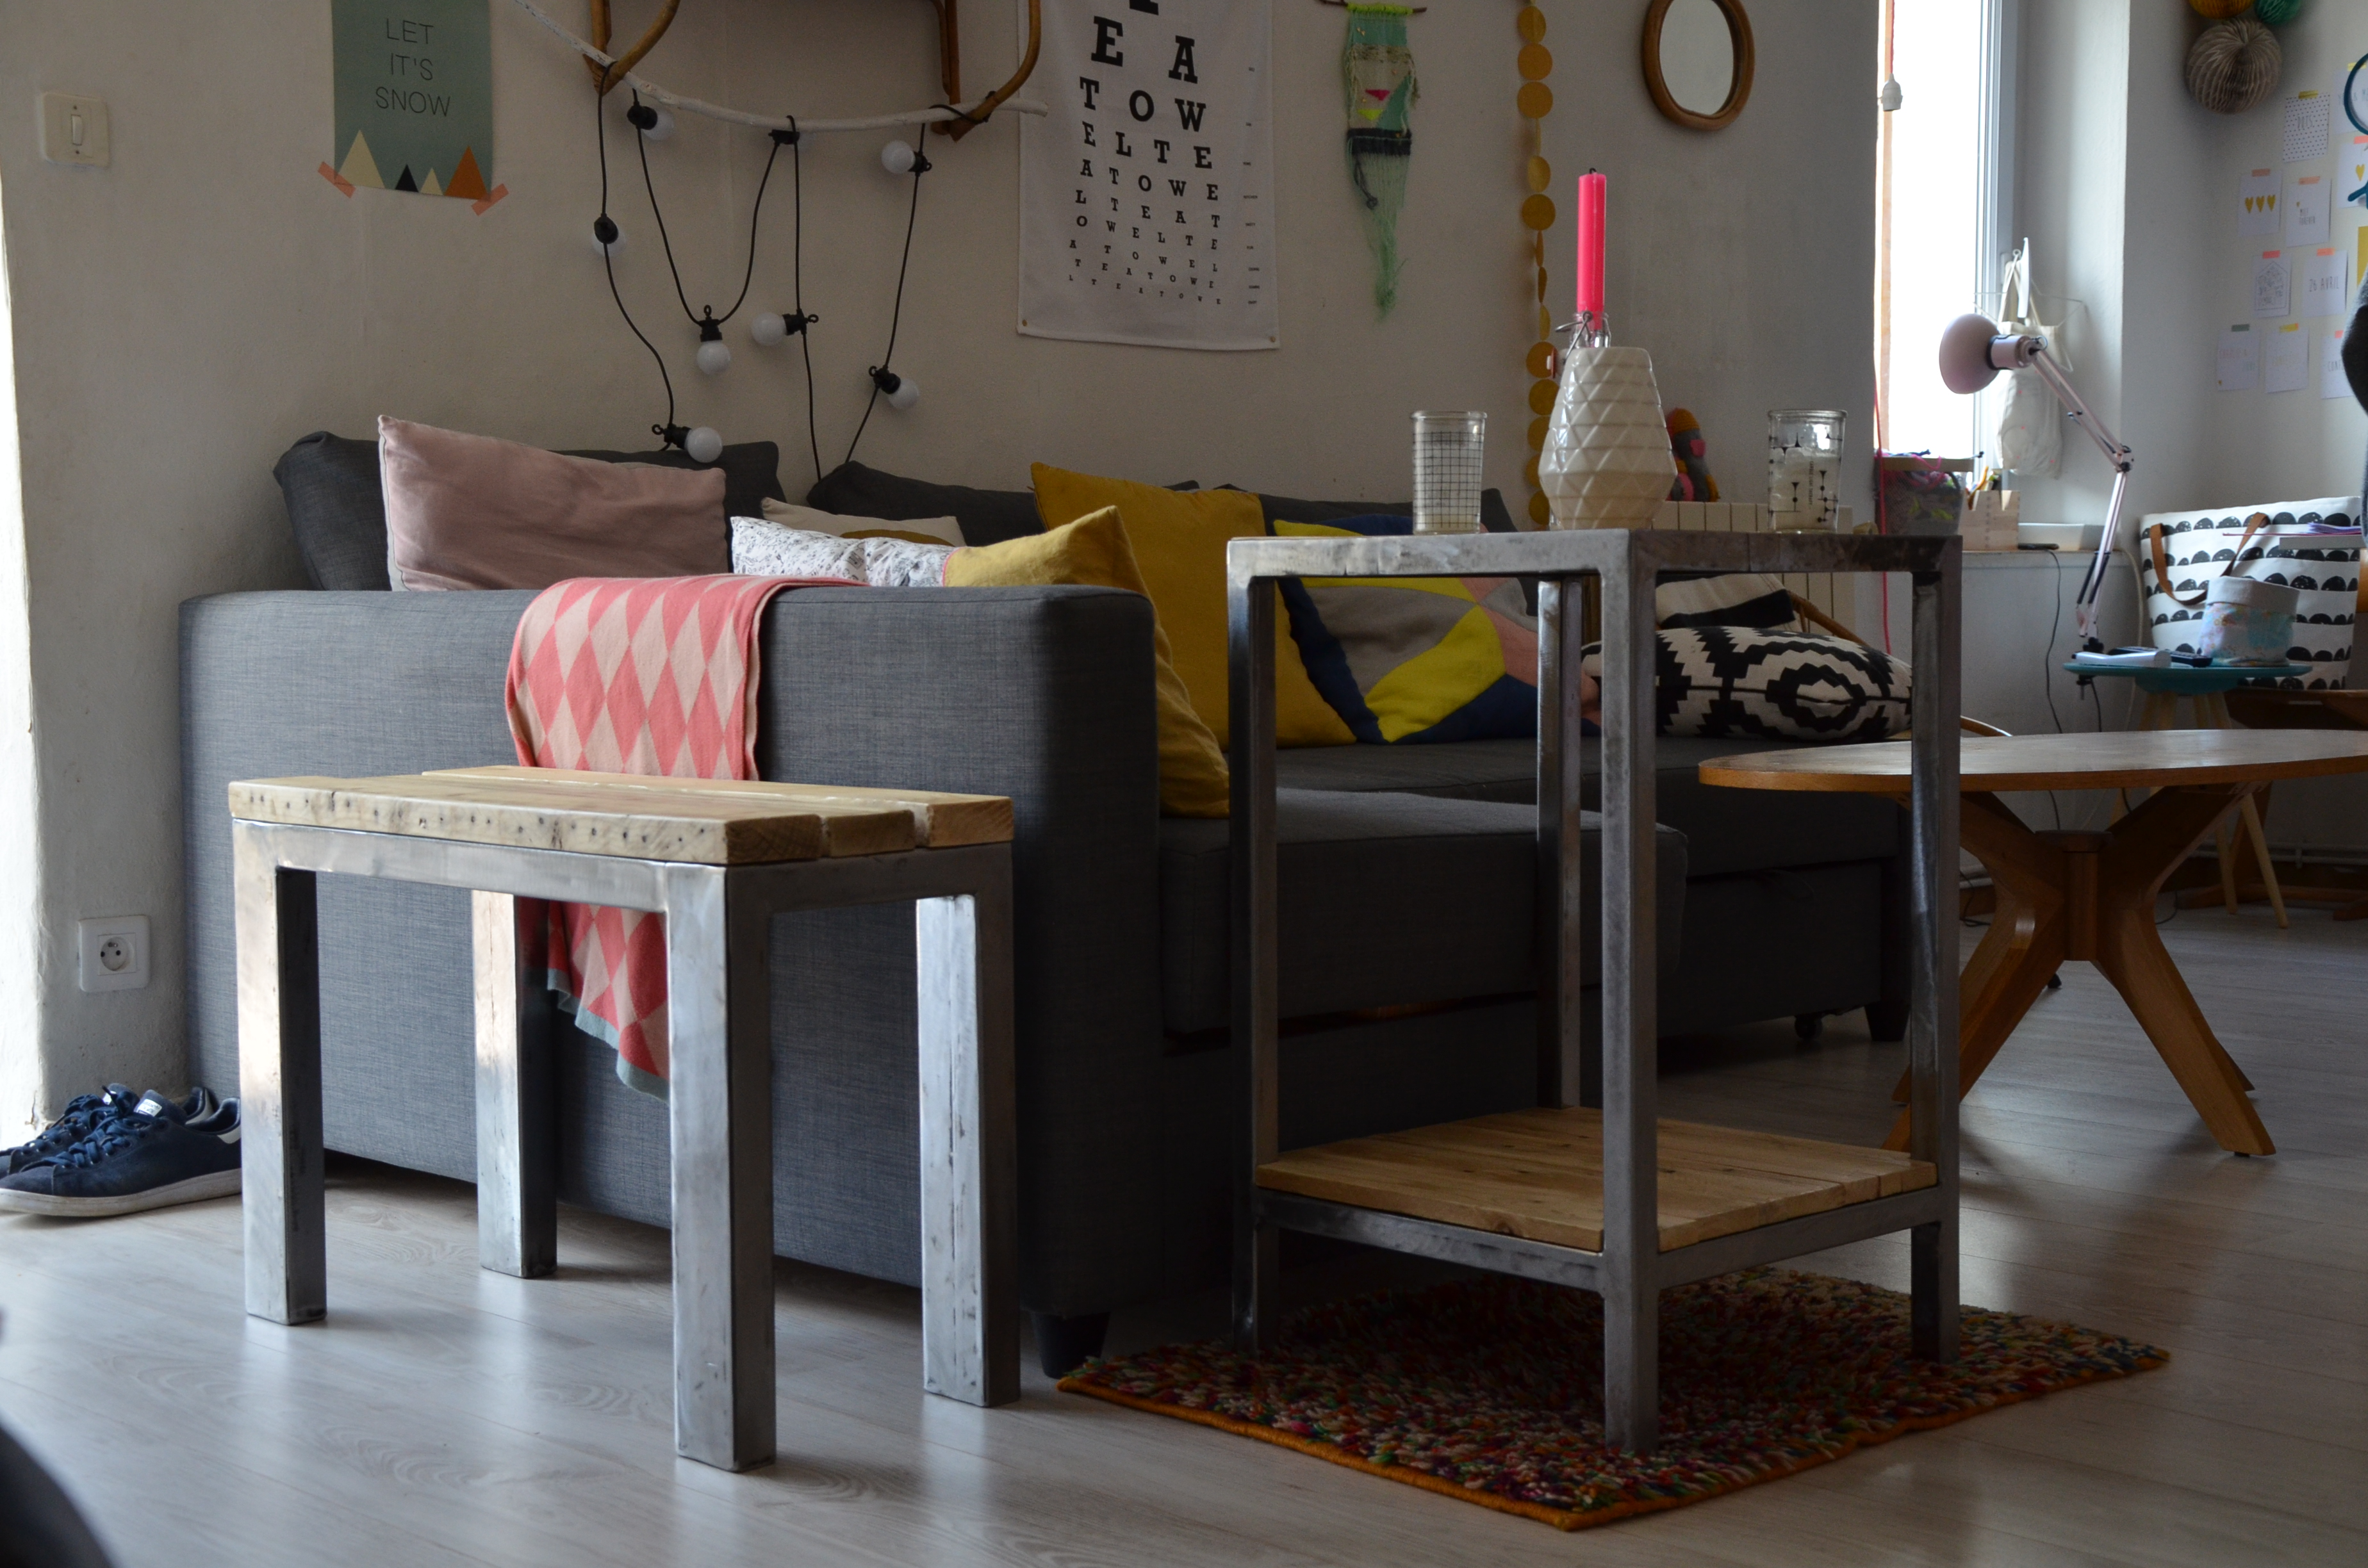 desserte salon et banc romuald noirot. Black Bedroom Furniture Sets. Home Design Ideas